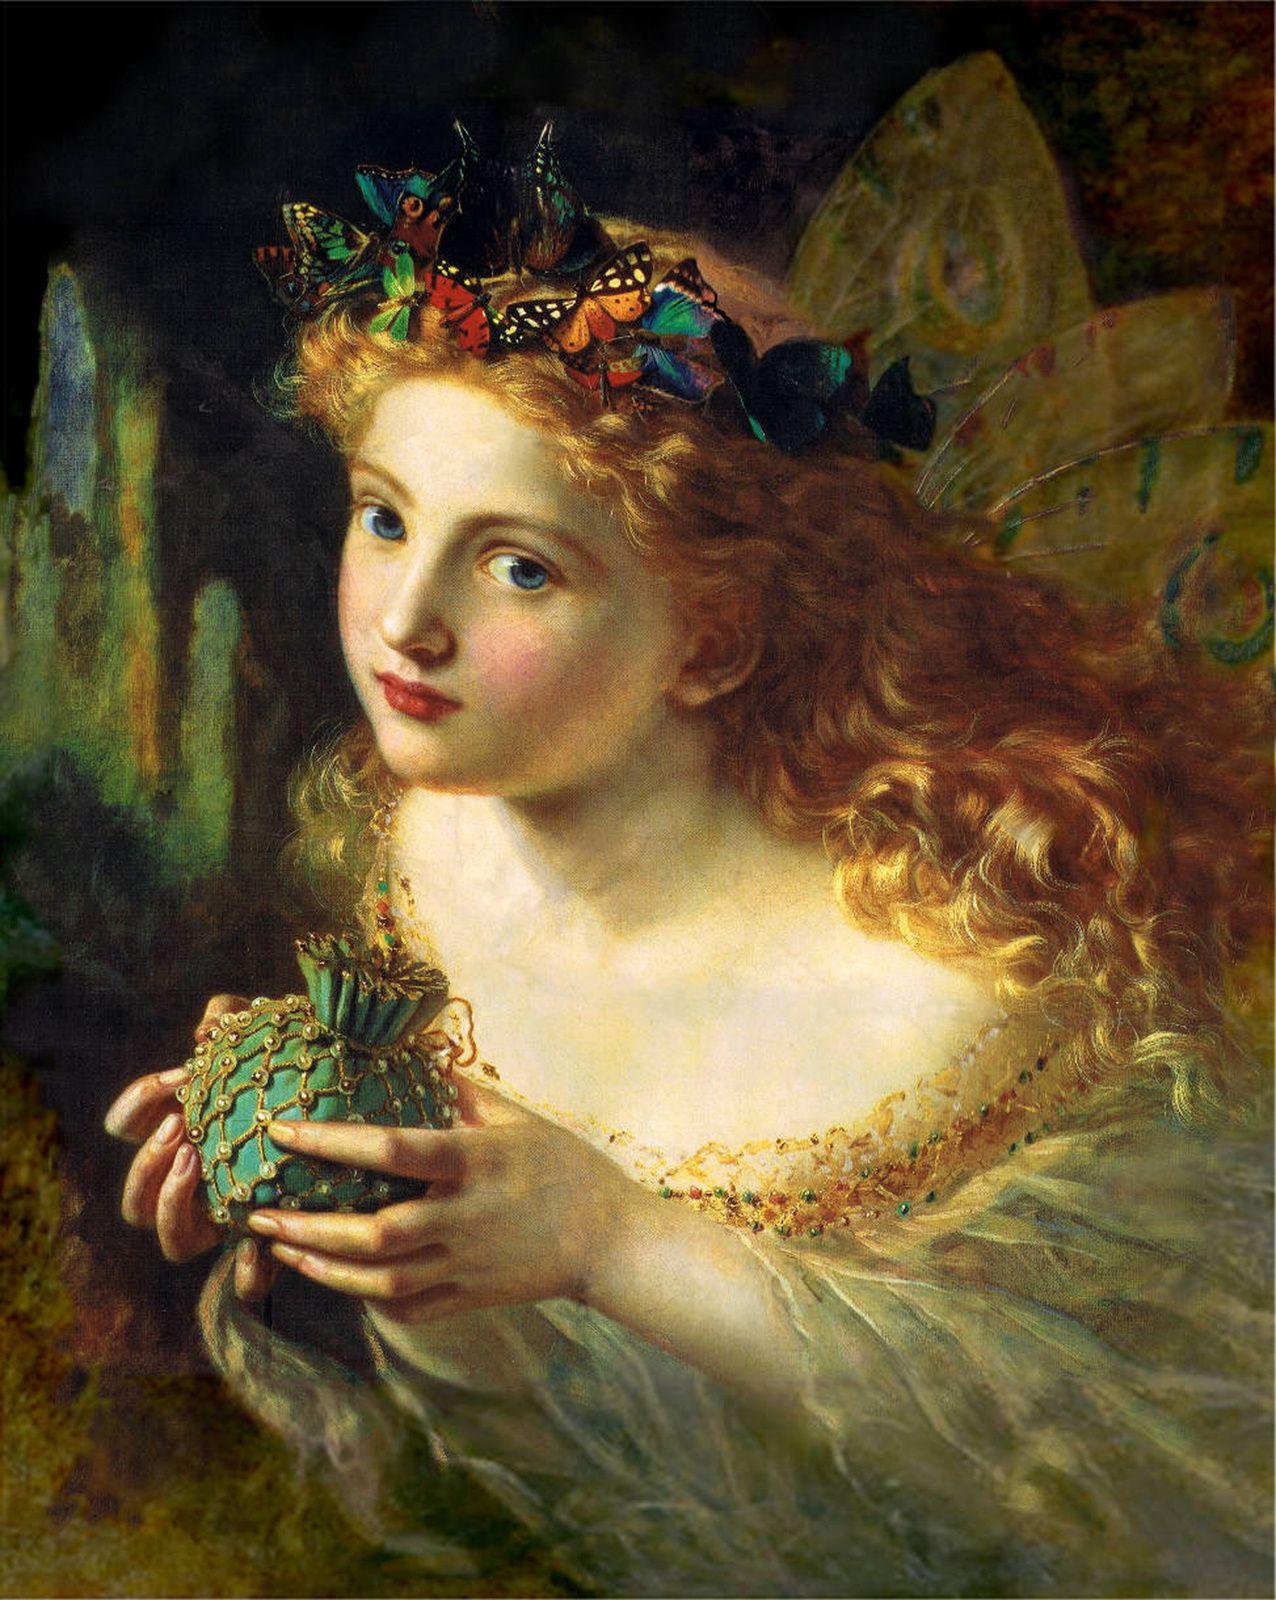 Peinture préraphaélite représentant une fée. Take the Fair Face of Woman, and Gently Suspending, With Butterflies, Flowers, and Jewels Attending, huile sur toile, Sophie Anderson (1823 - 1903), collection privée, Londres.